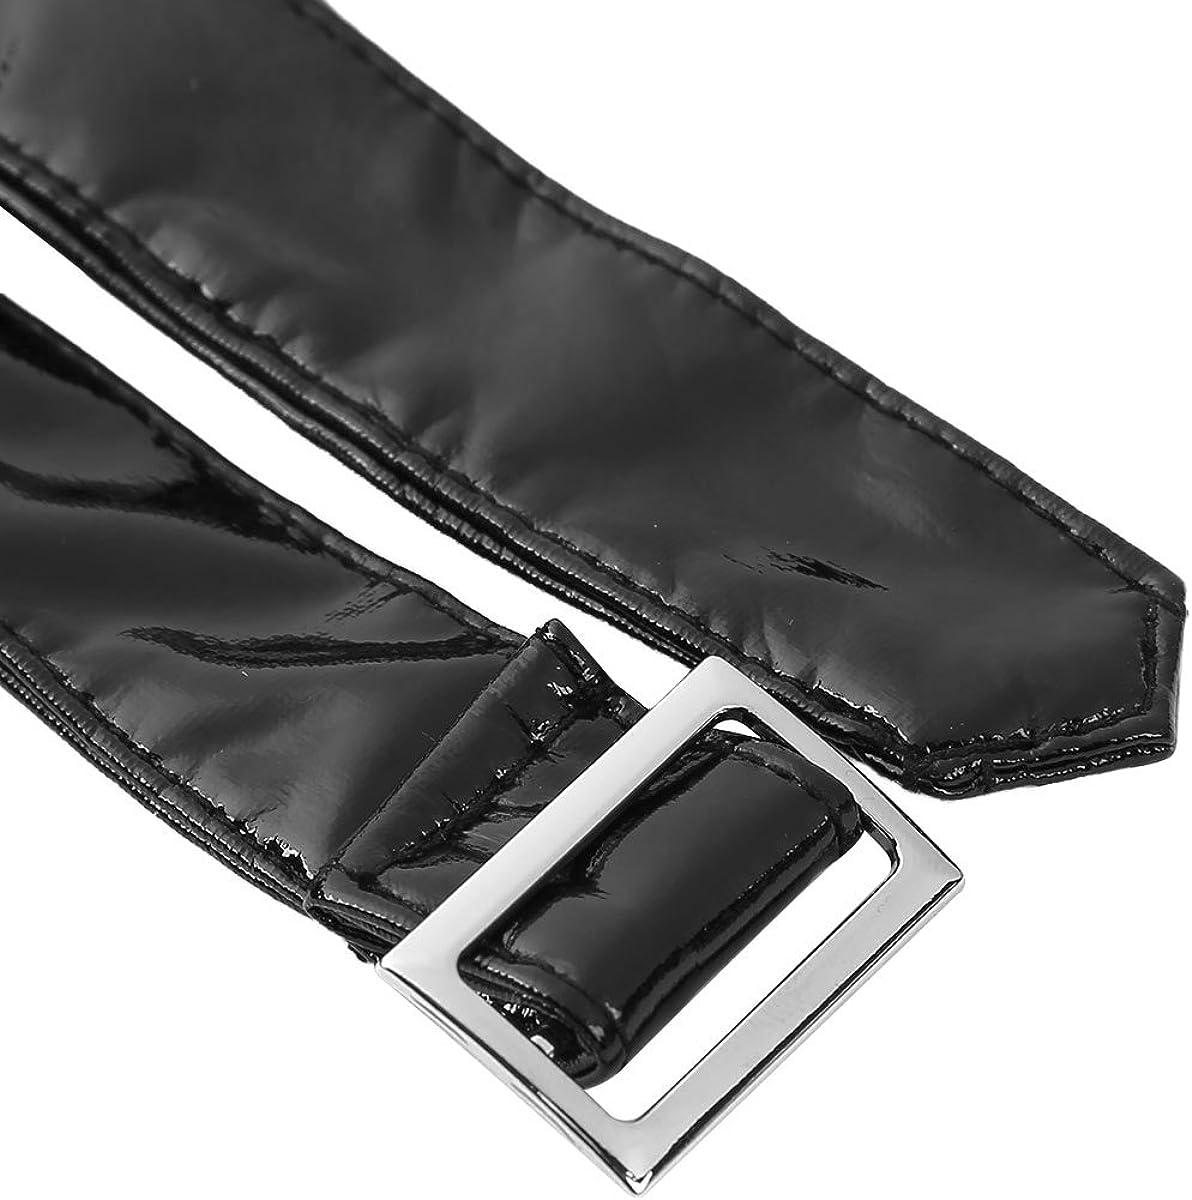 iEFiEL Womens Welook PVC Leather Zipper Side Studded Booty Shorts Hot Pants Clubwear